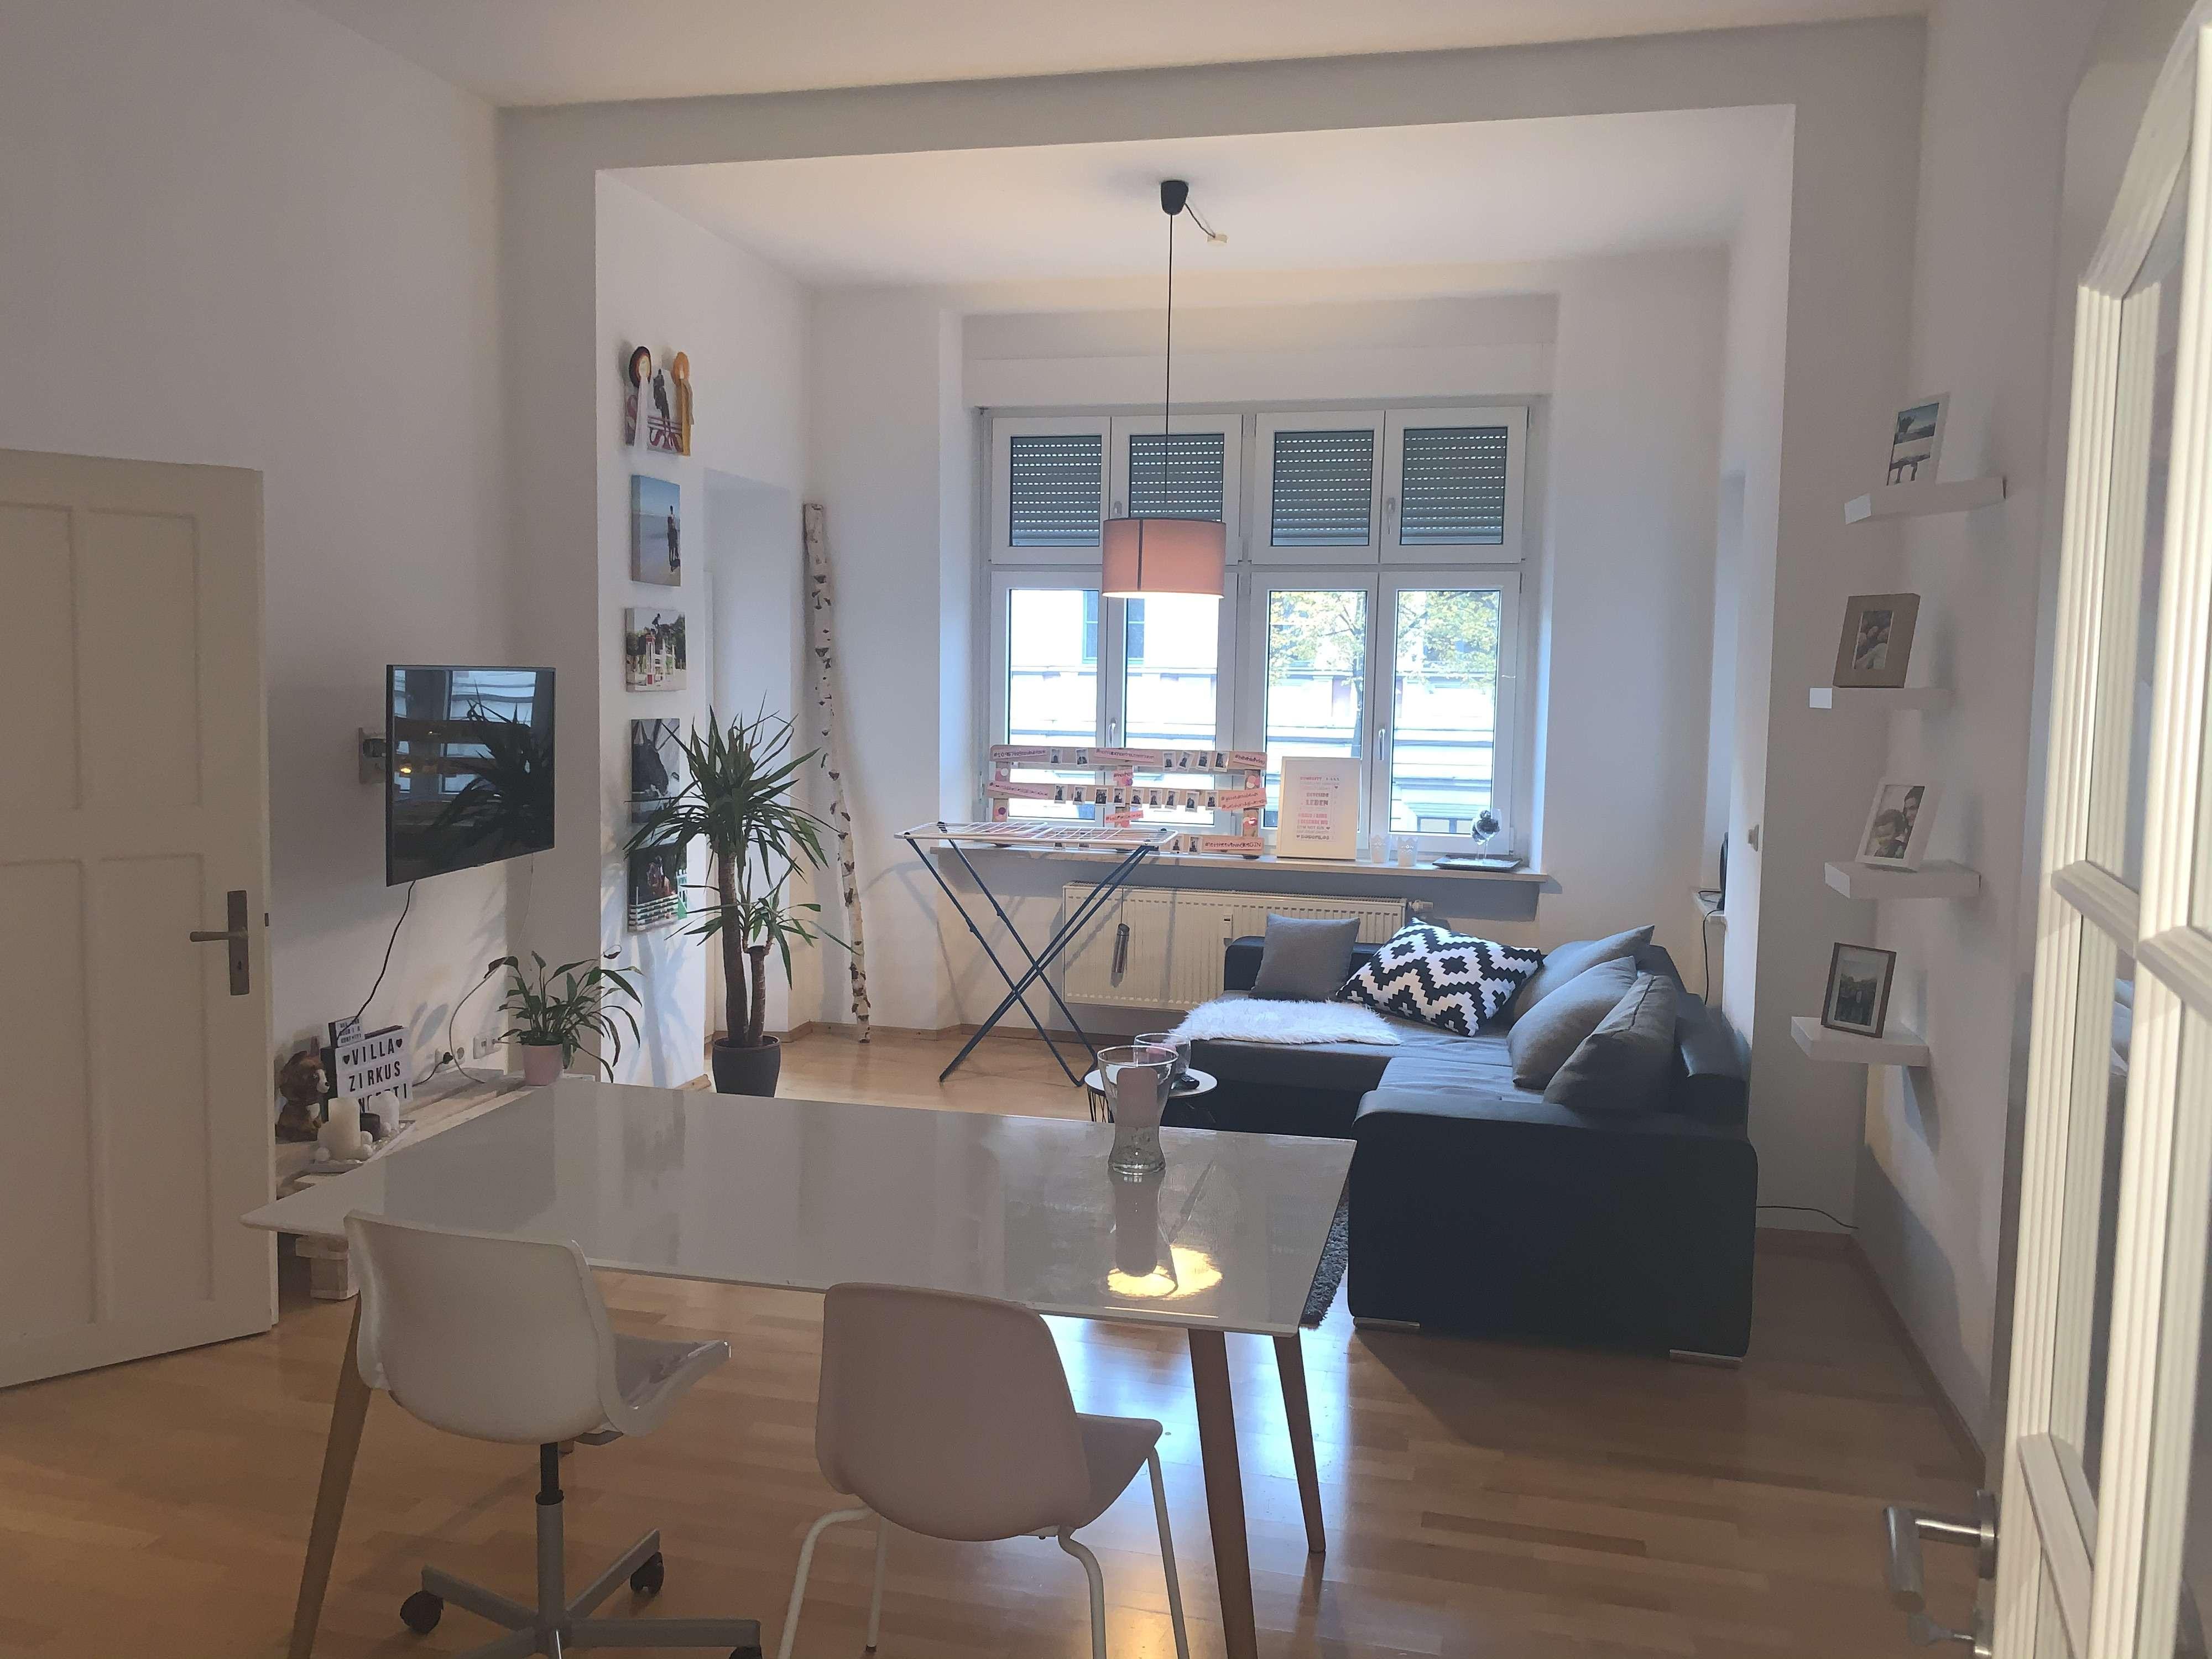 1050 €, 84 m², 3 Zimmer, nähe 300m HBF / Kö / Innenstadt in Augsburg-Innenstadt